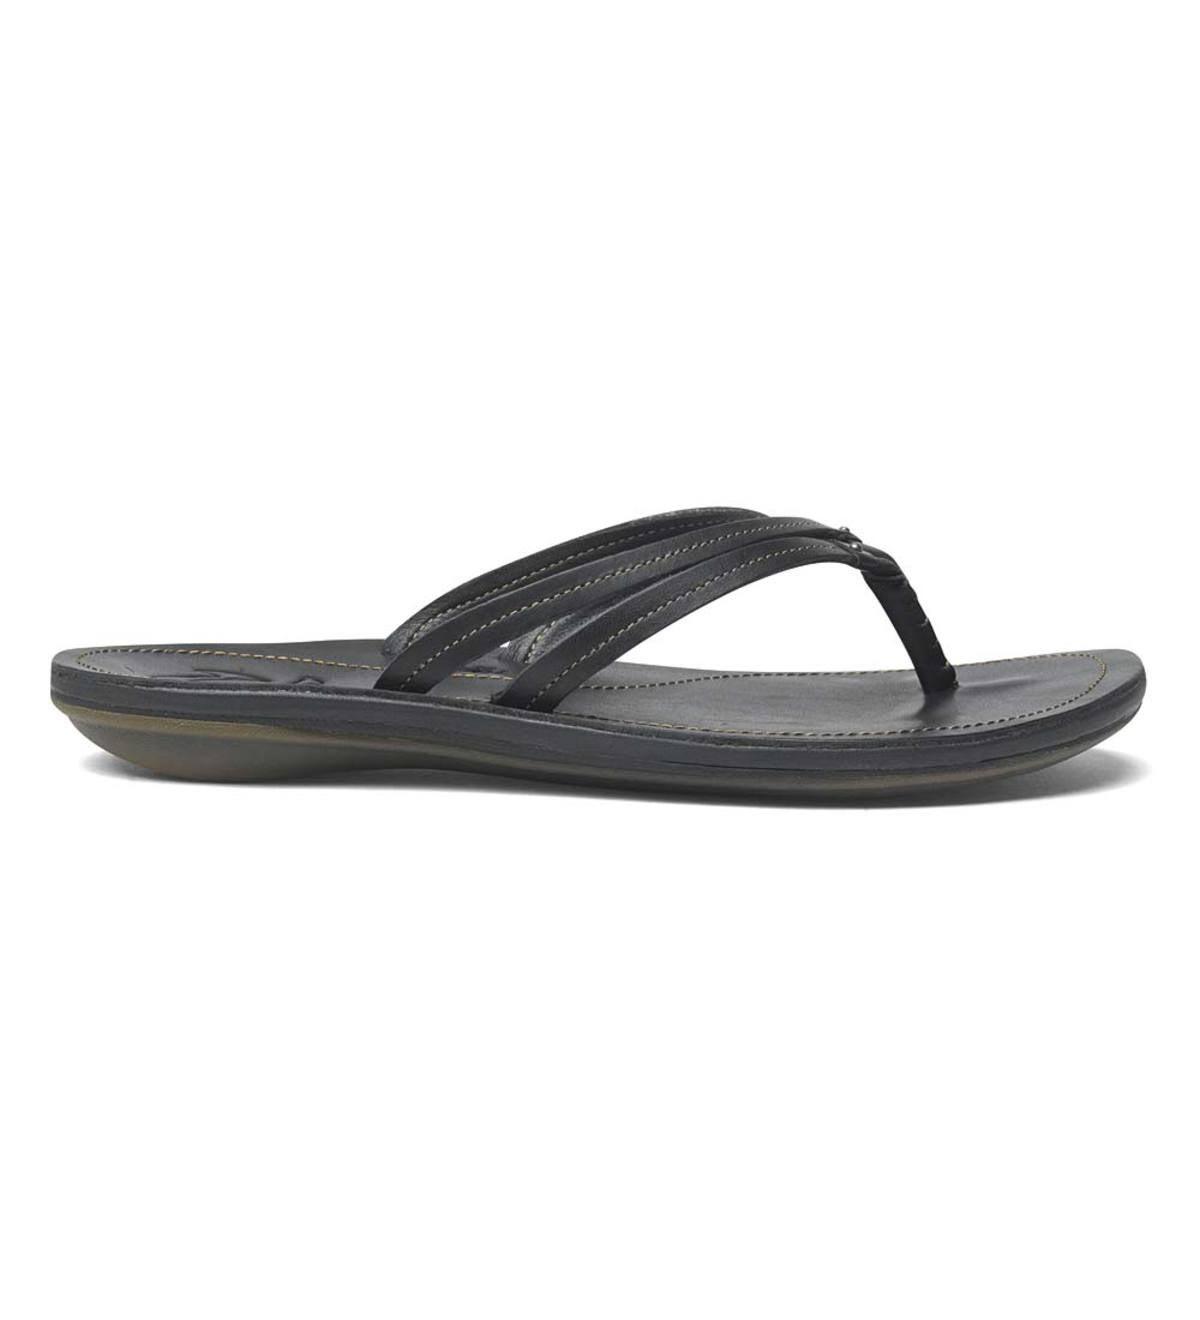 e455c4afdf90 Women s OluKai® U i Dual Strap Flip-Flop Sandals - Black Black